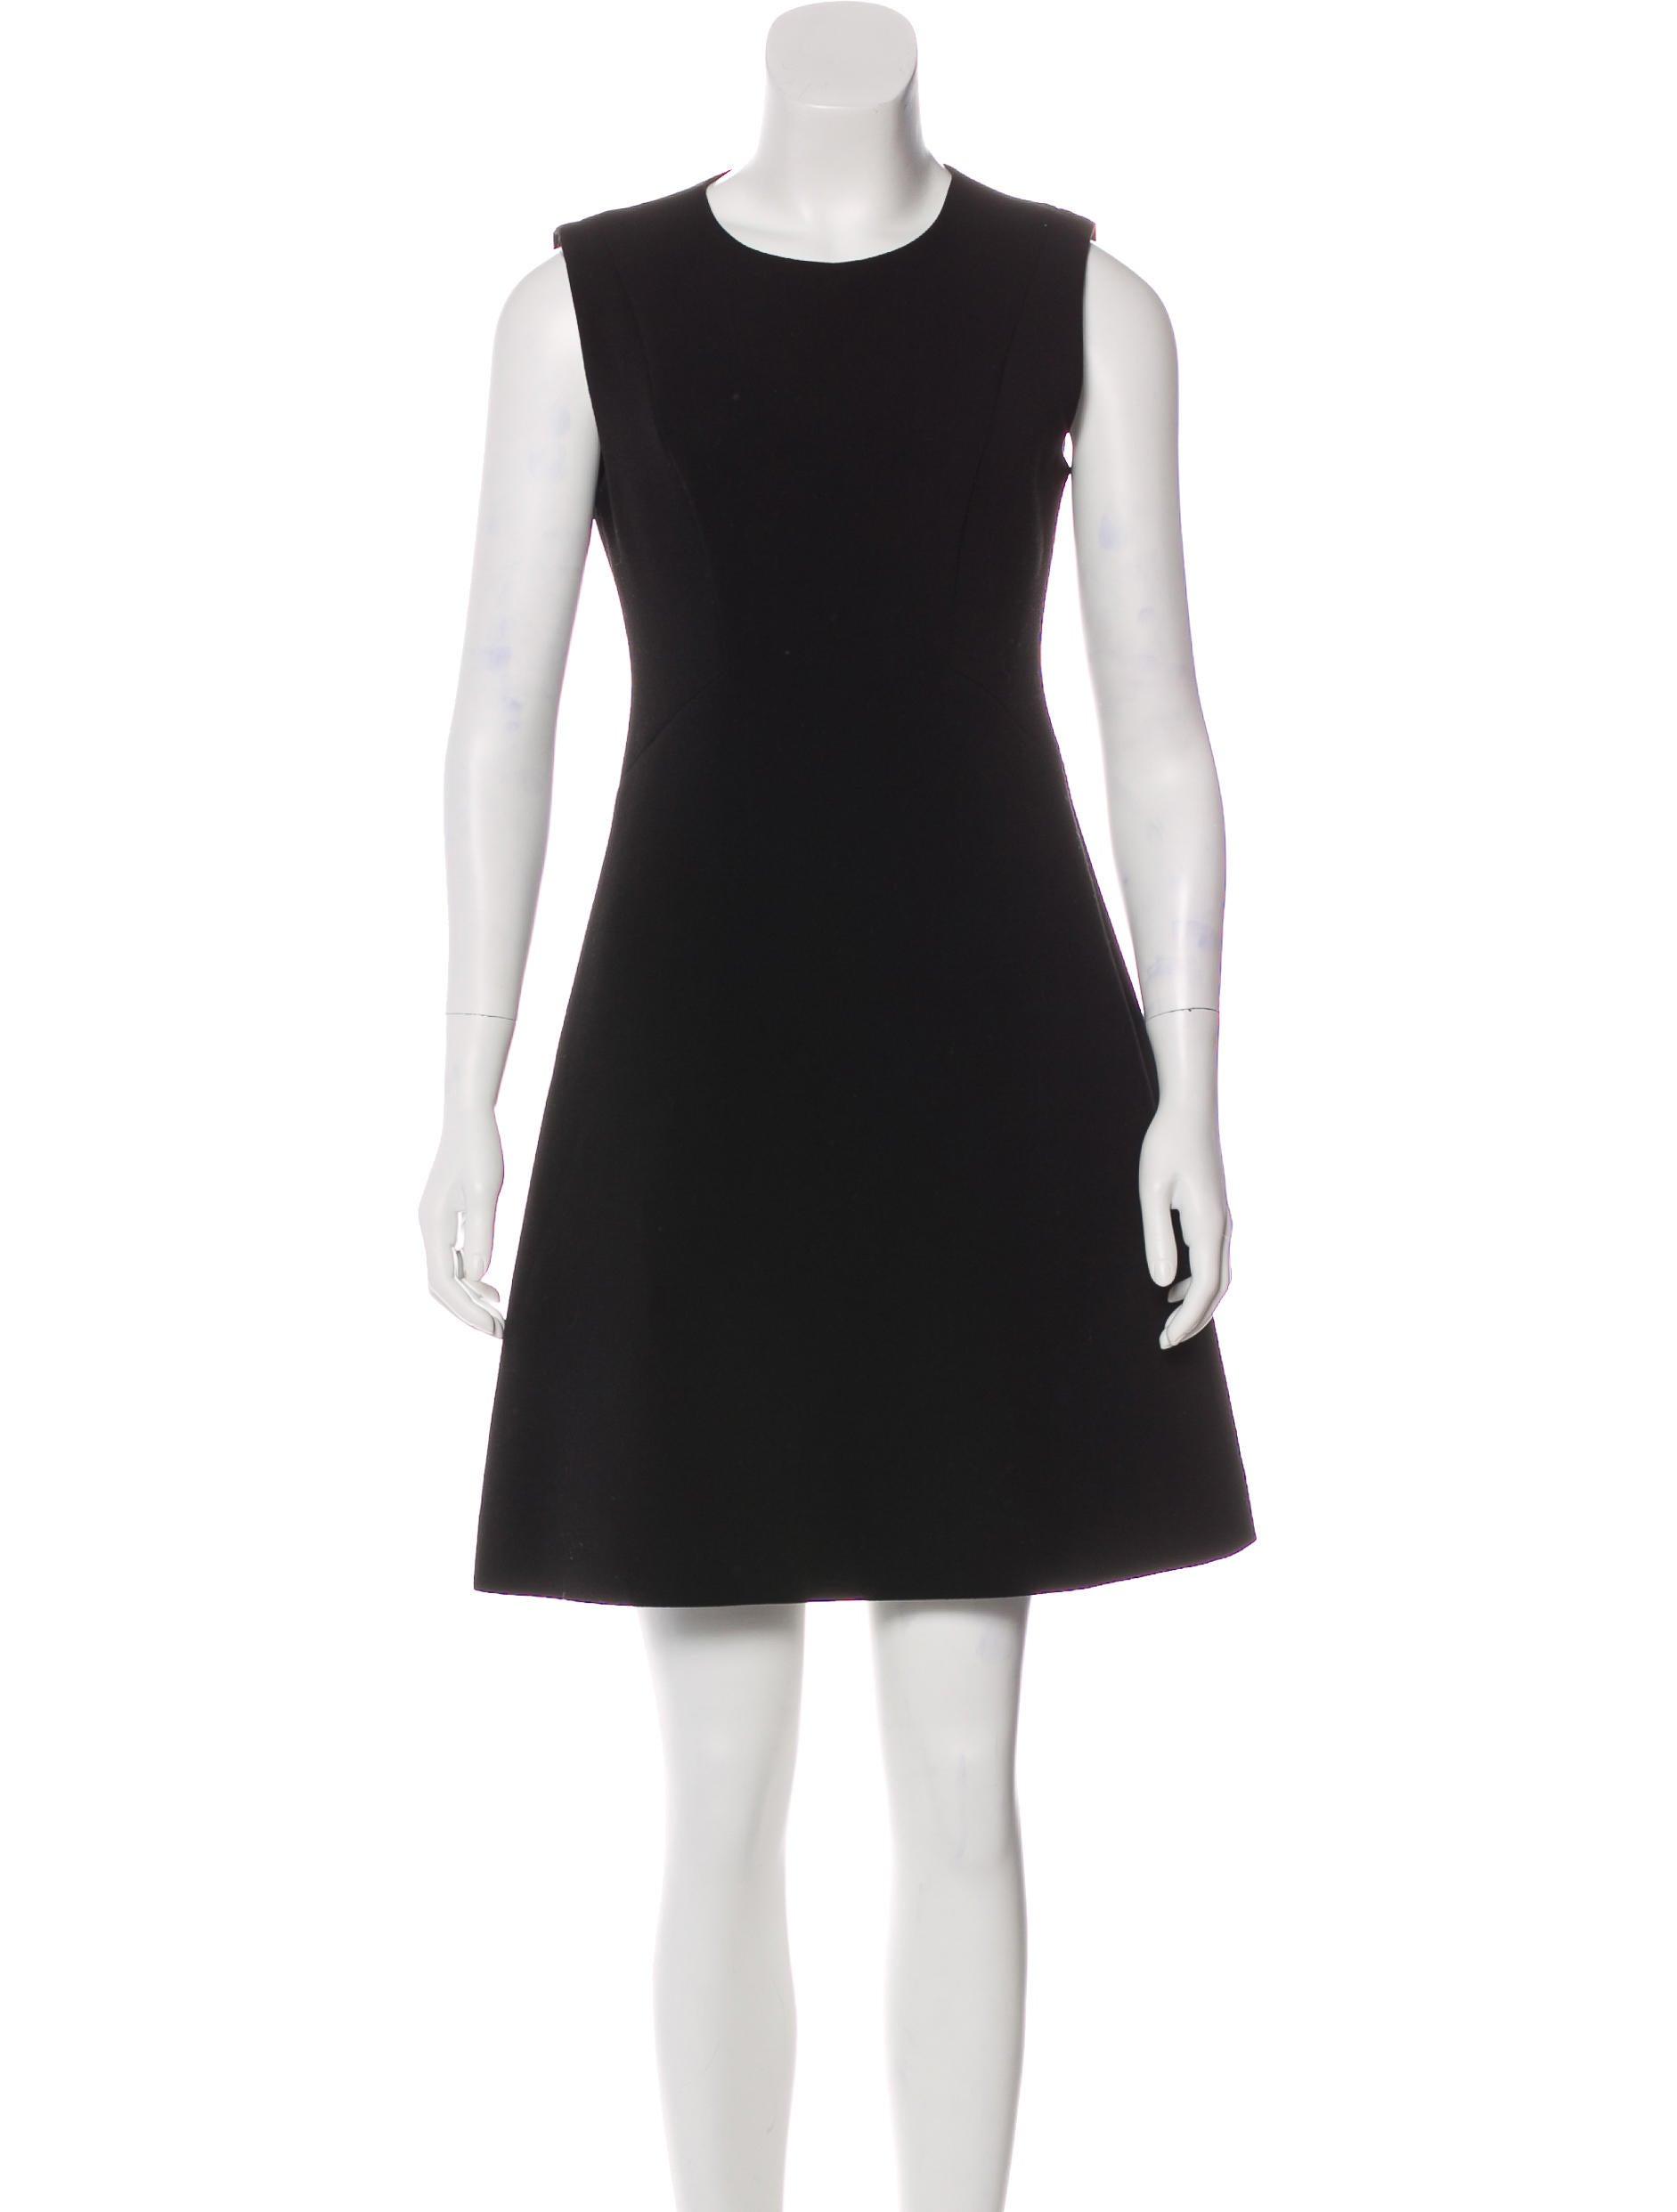 Kate Spade New York Sleeveless Mini Dress - Clothing -           WKA99711 | The RealReal